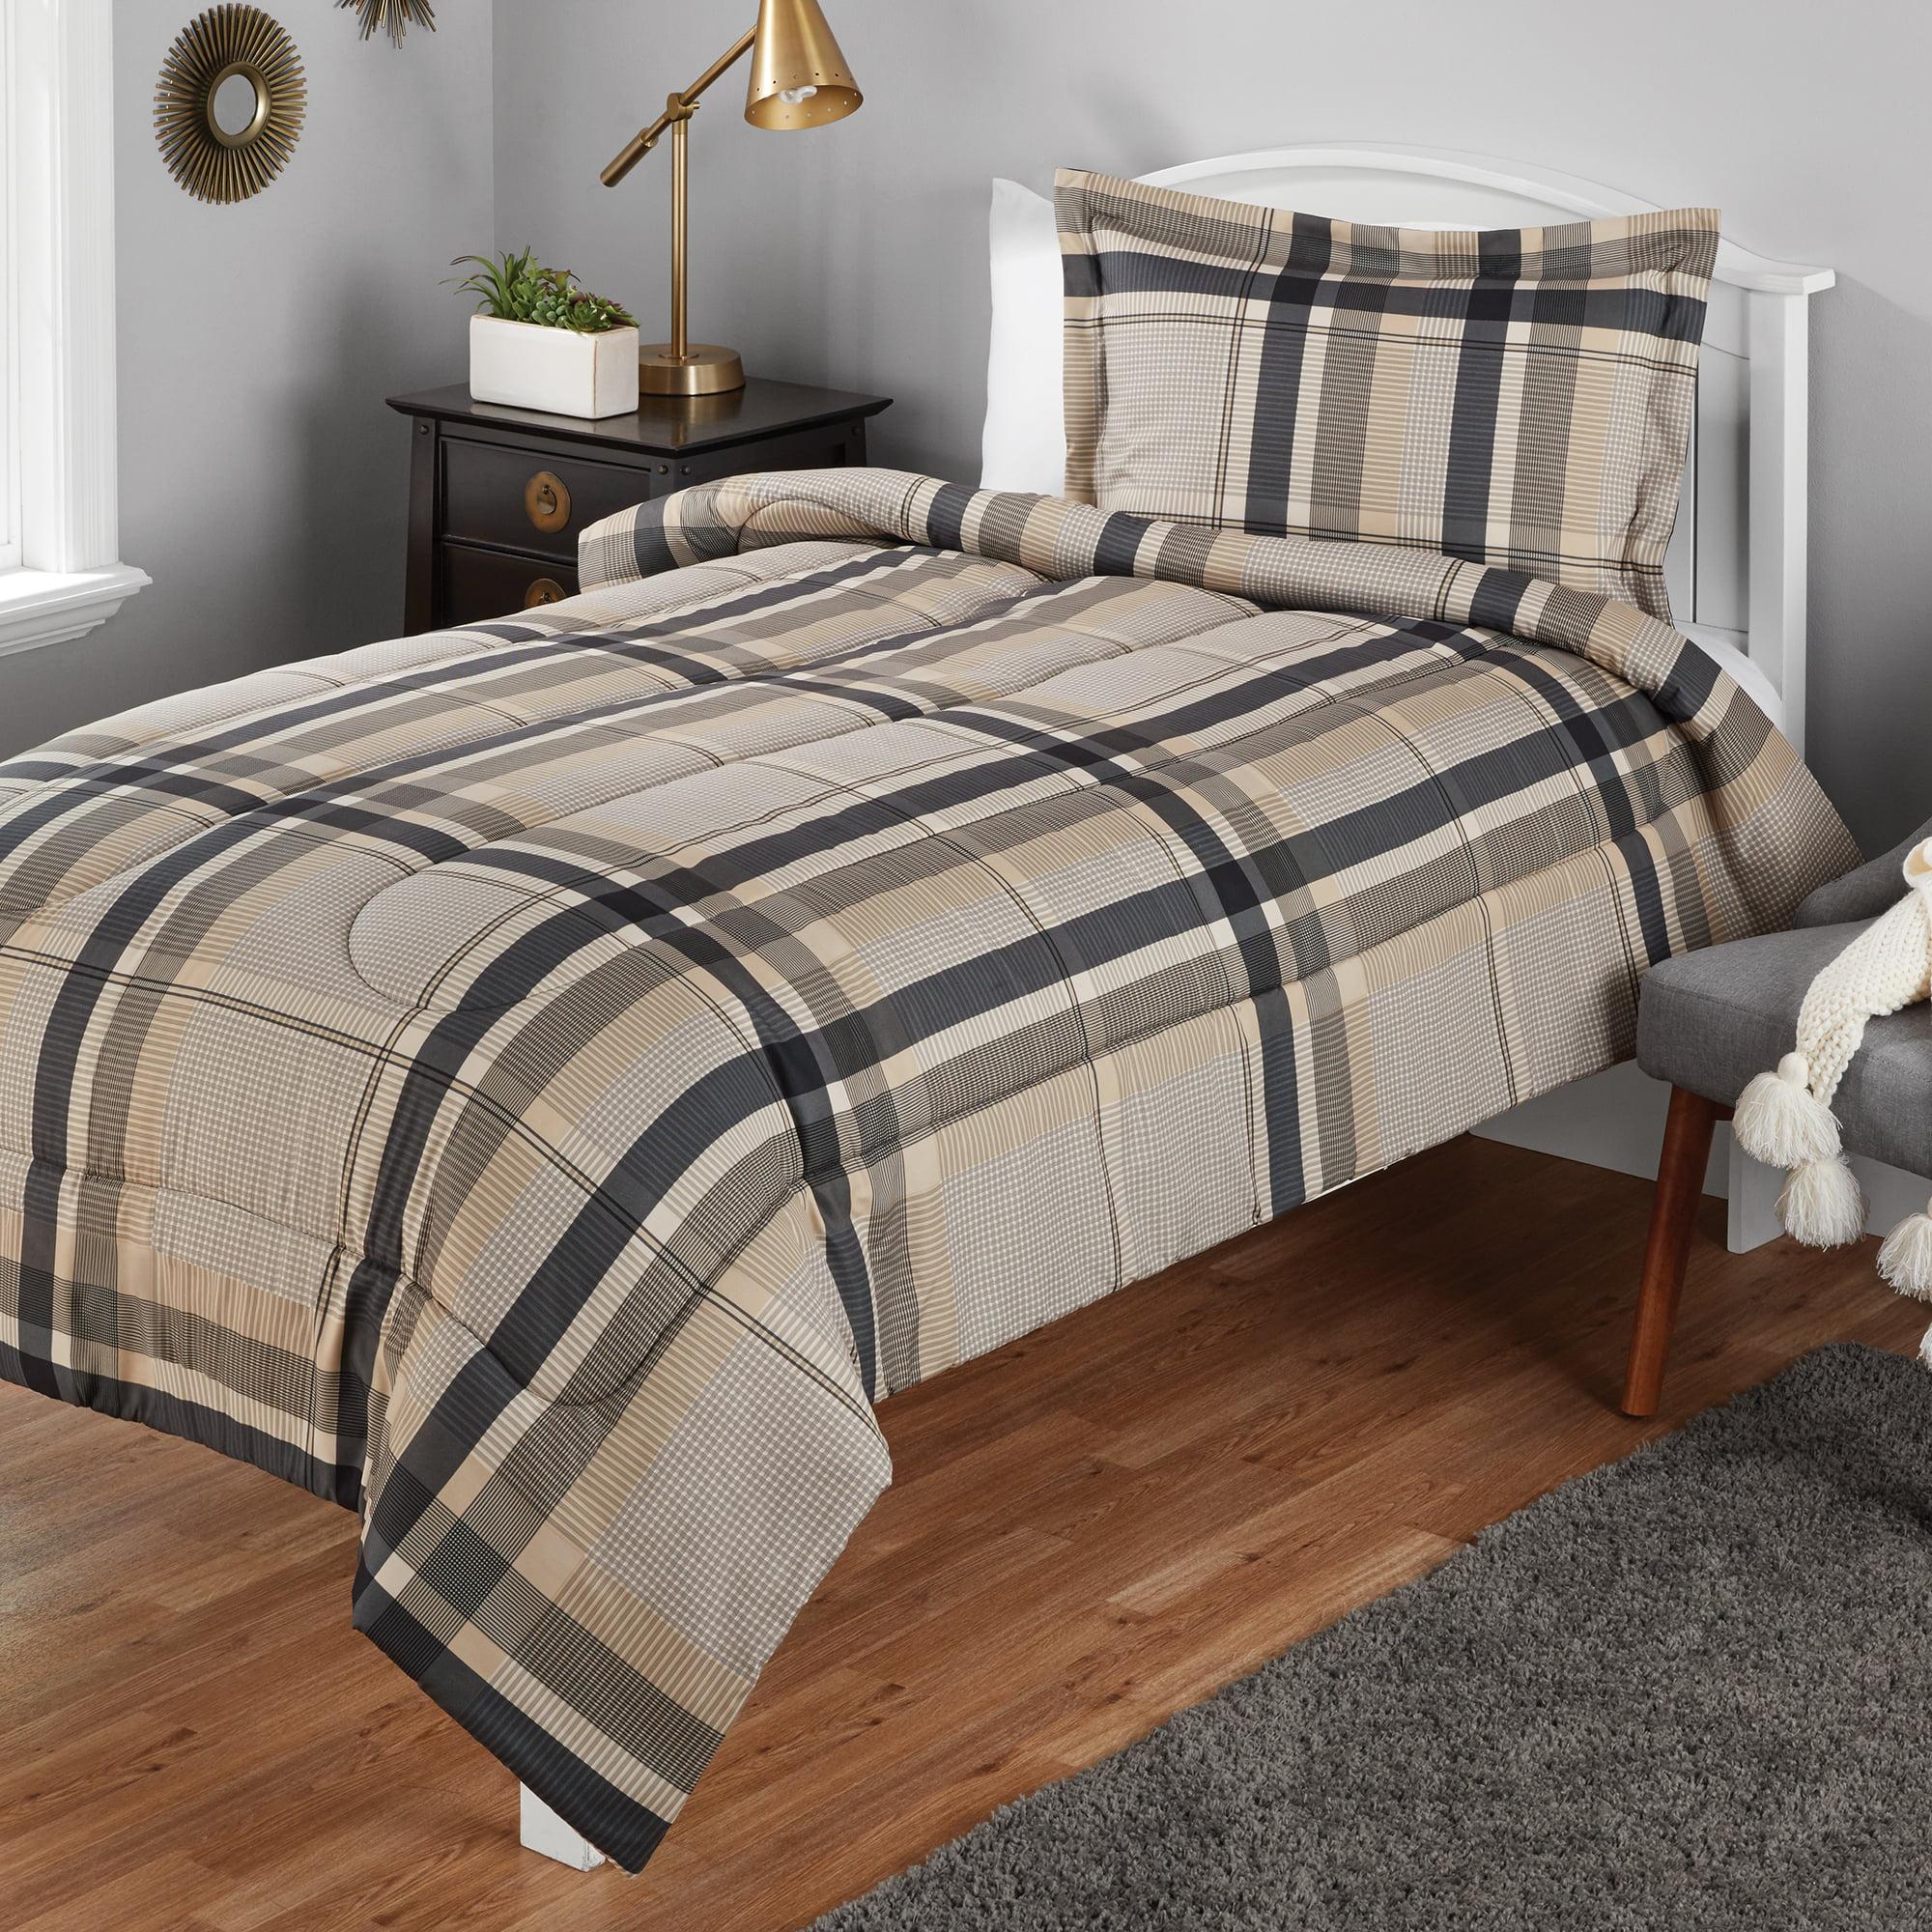 Mainstays Twin Or Twin Xl Plaid Printed Black Tan Comforter Mini Set 2 Piece Walmart Com Walmart Com